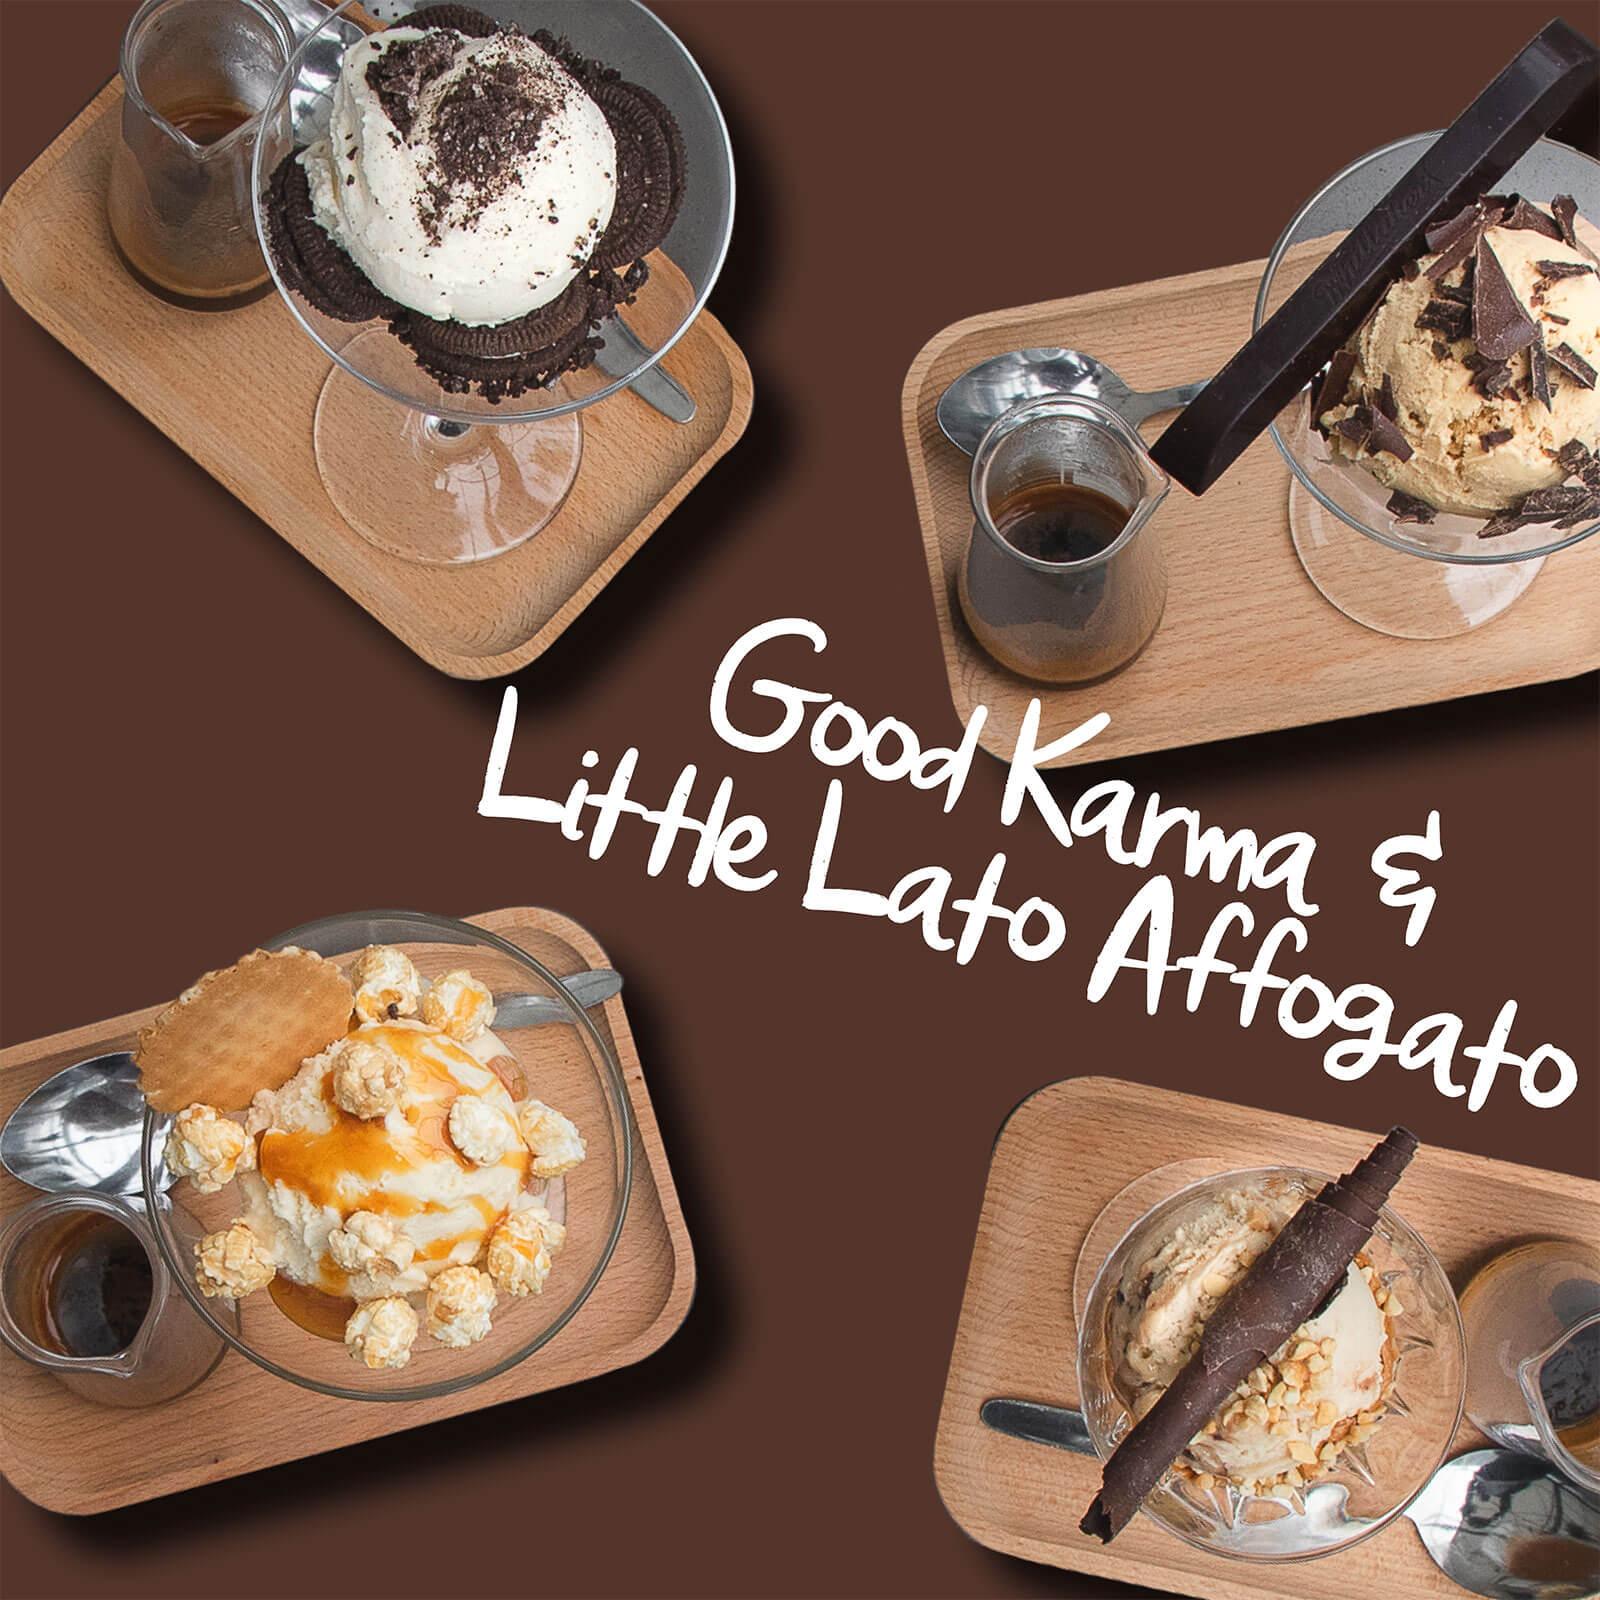 Restaurant Month Good karma and Little Lato Affogato